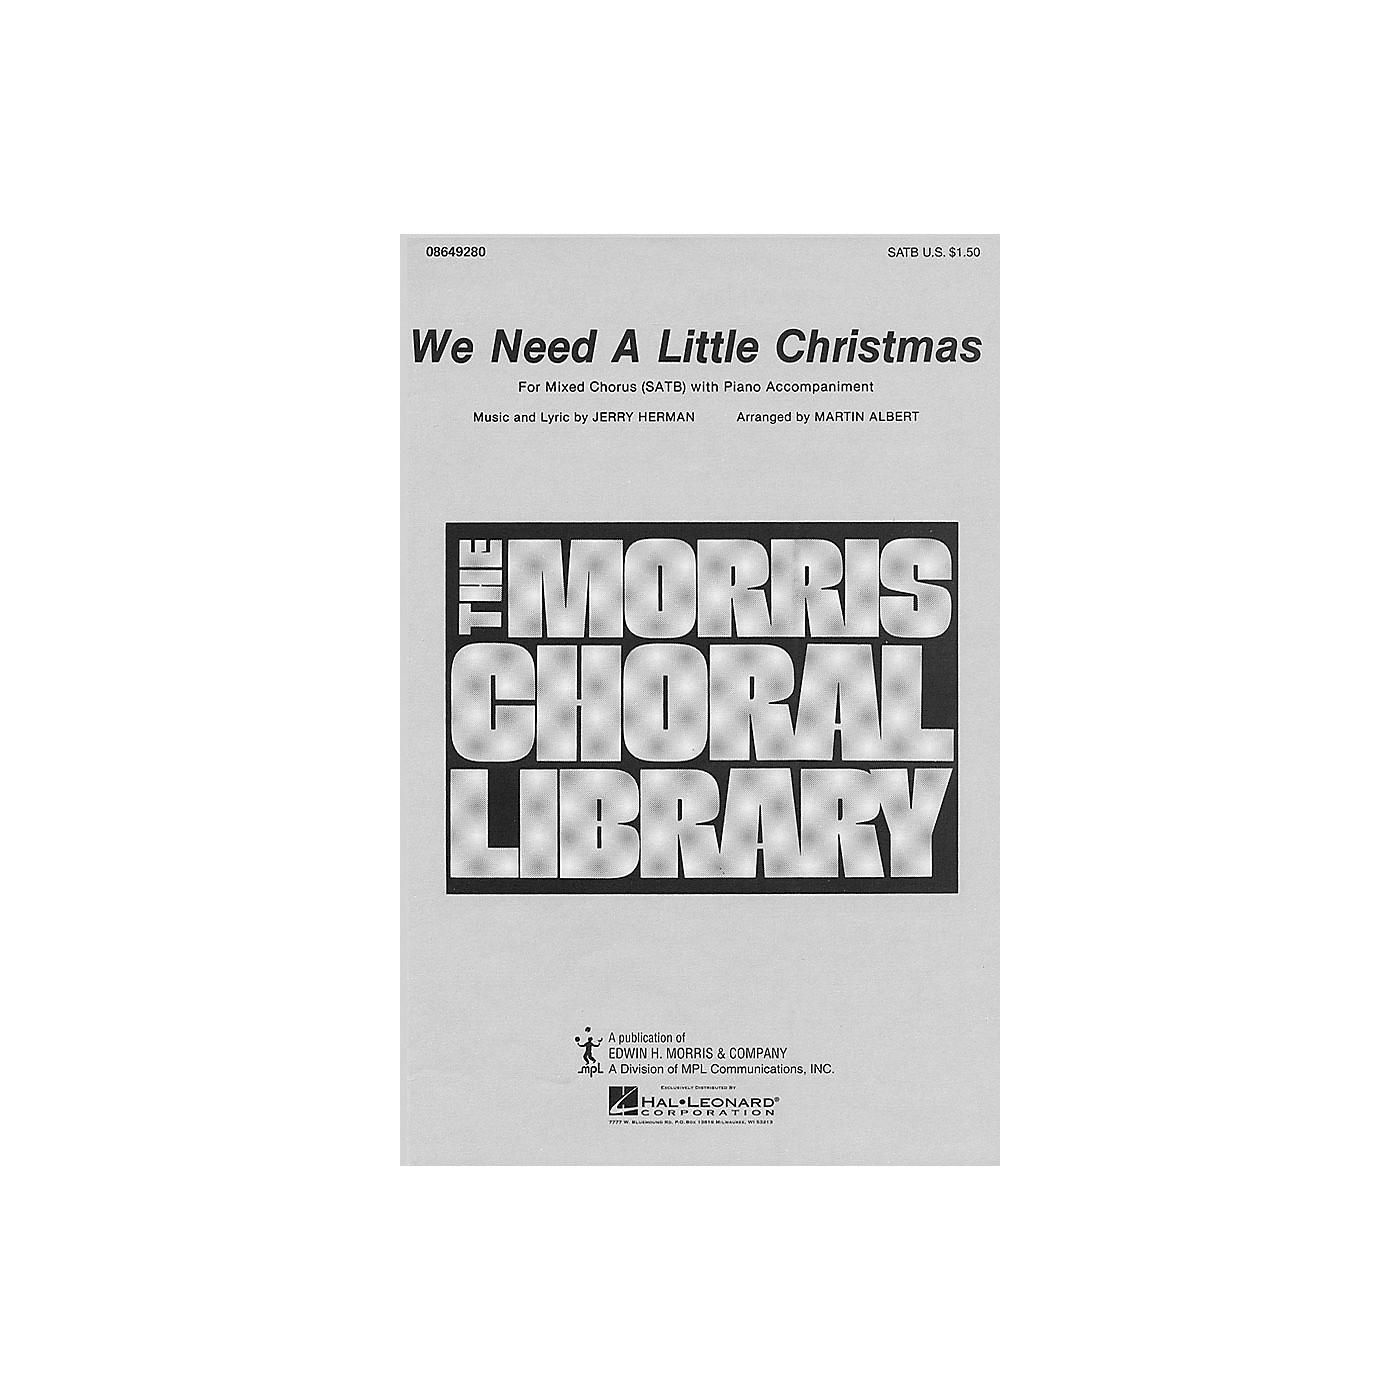 Hal Leonard We Need a Little Christmas (SATB) SATB arranged by Martin Albert thumbnail